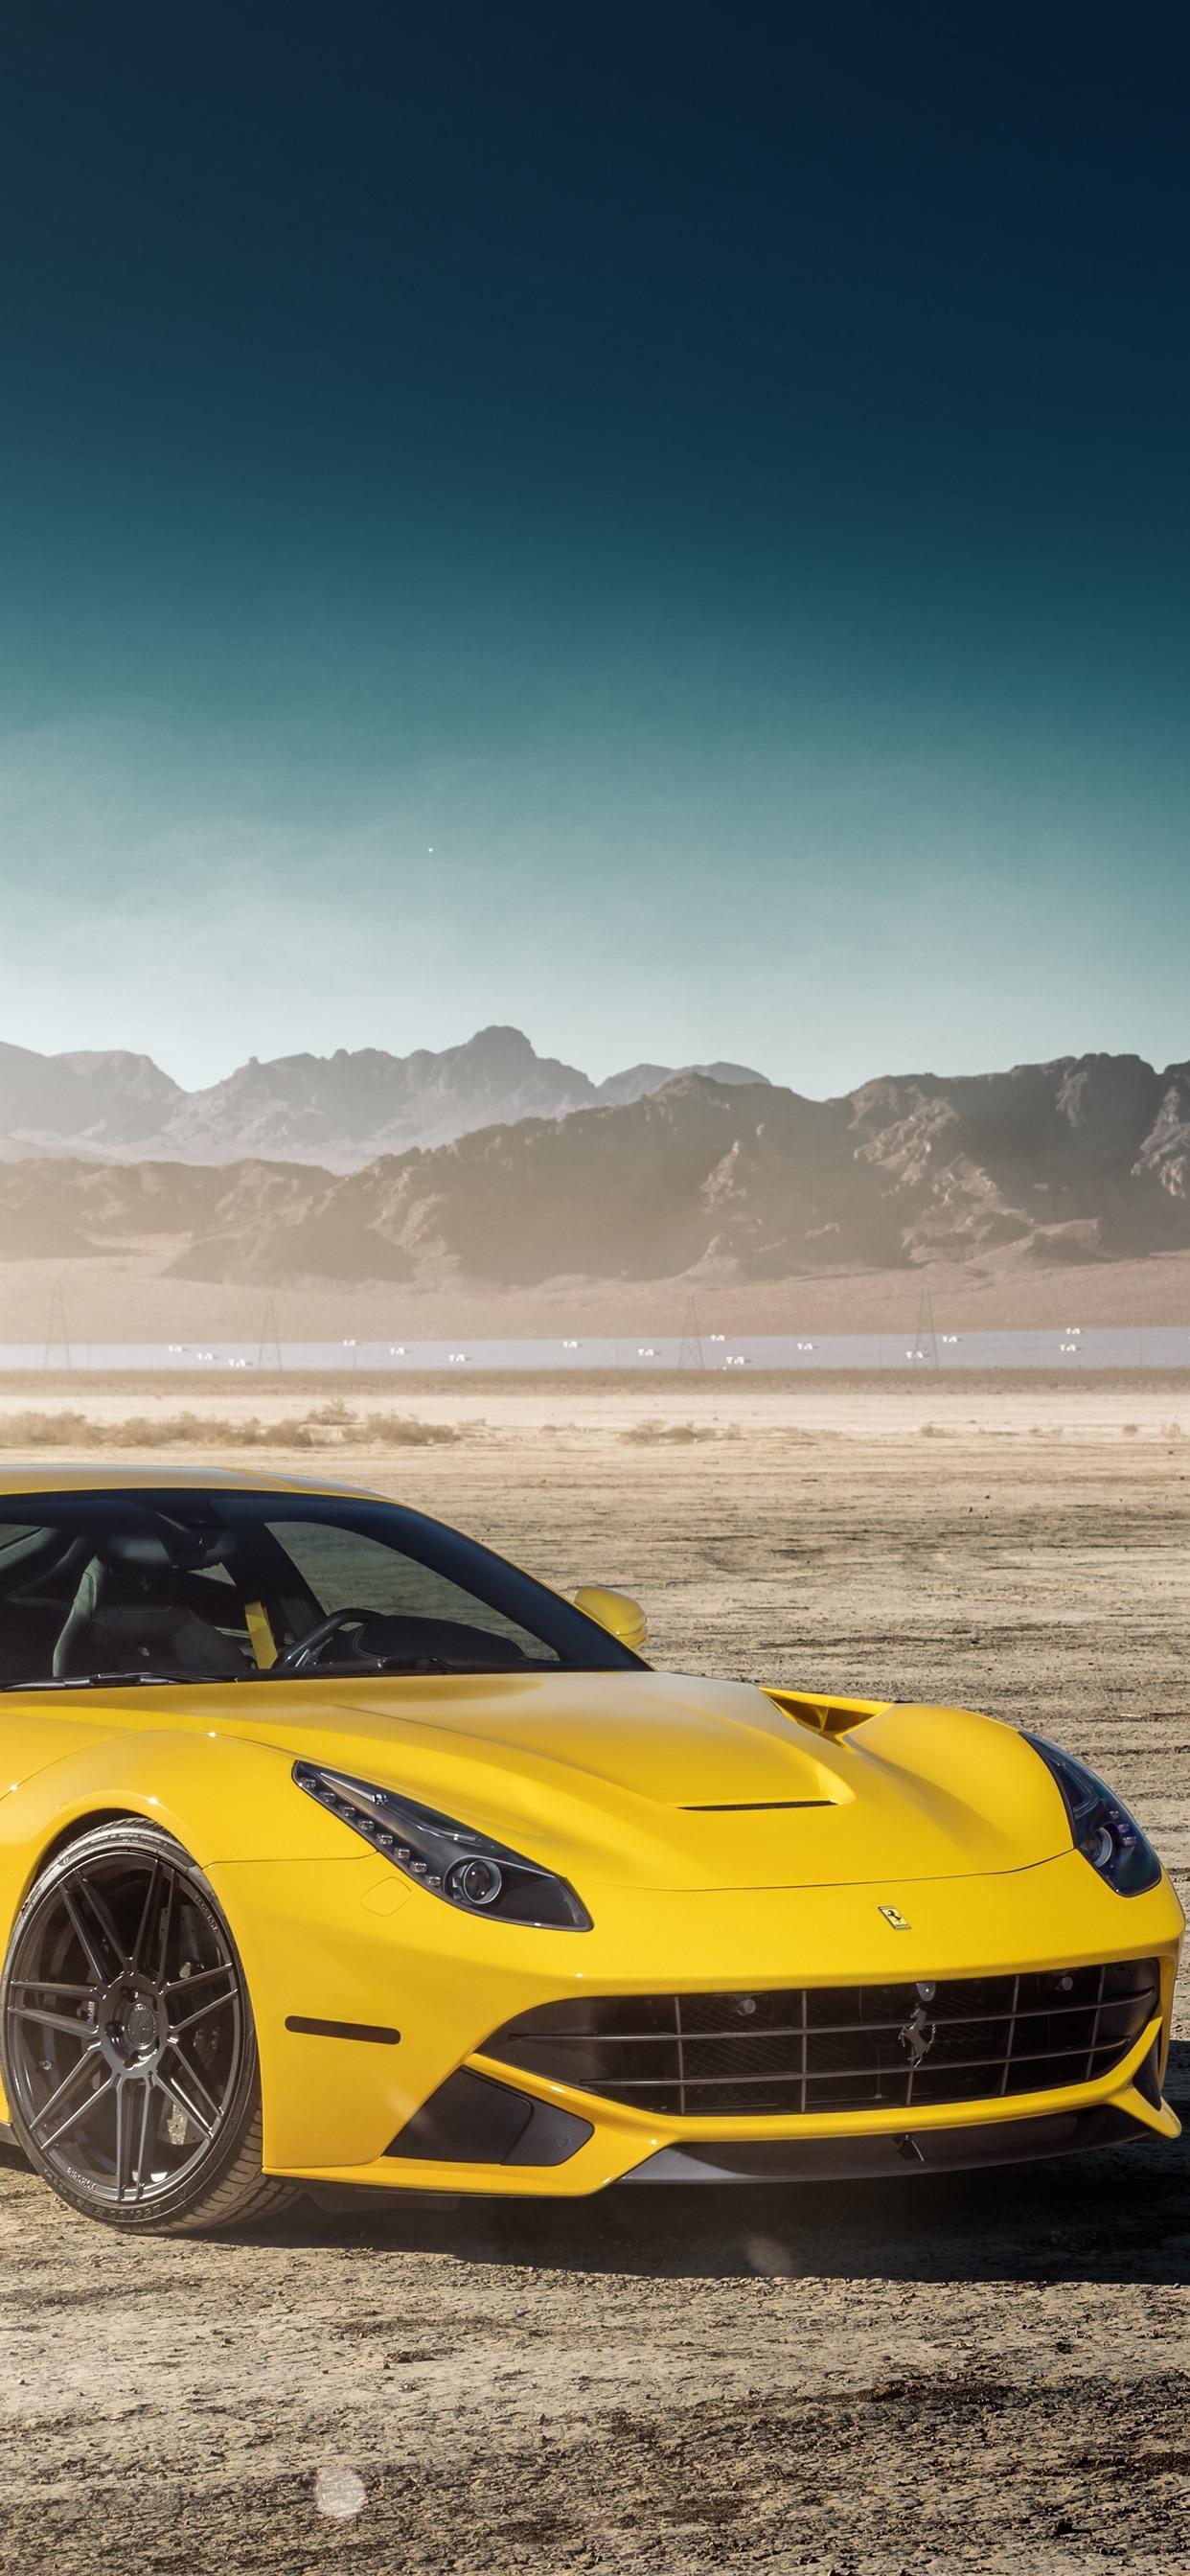 Mercedes Benz Gtr Green Supercar And Ferrari F12 Yellow Supercar